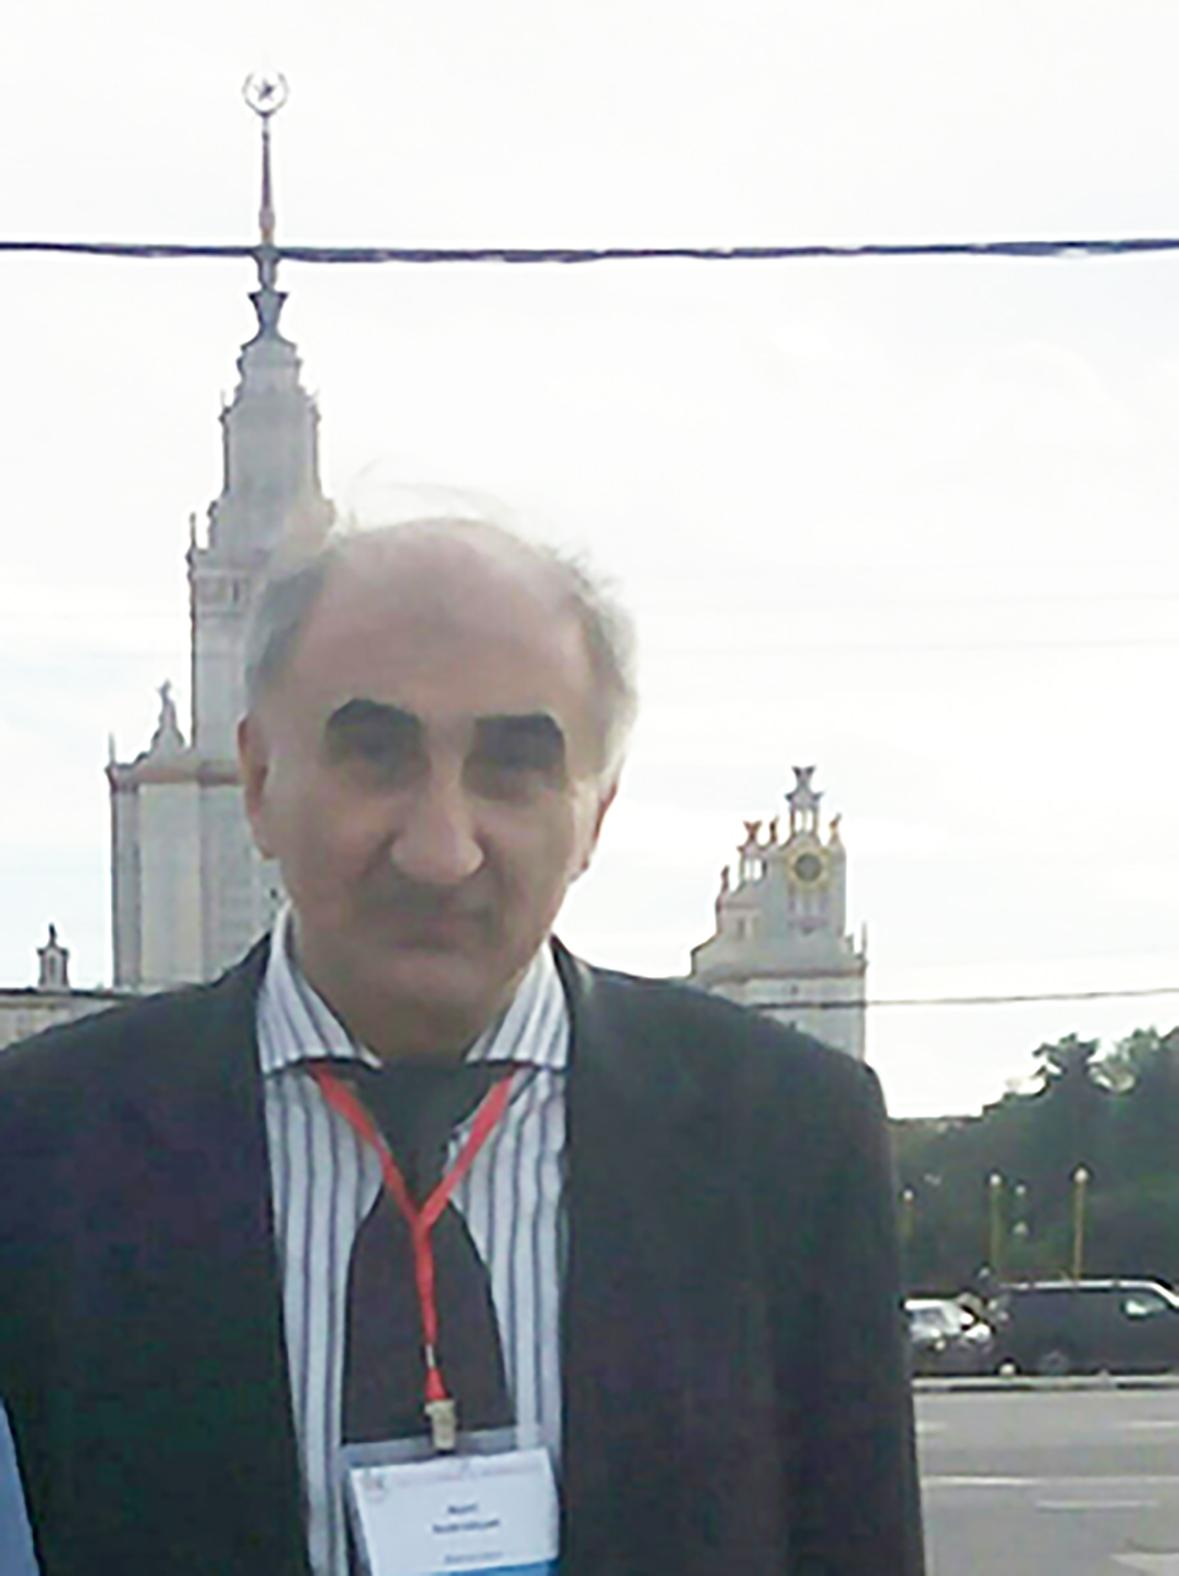 Sedrakyan in Moscow